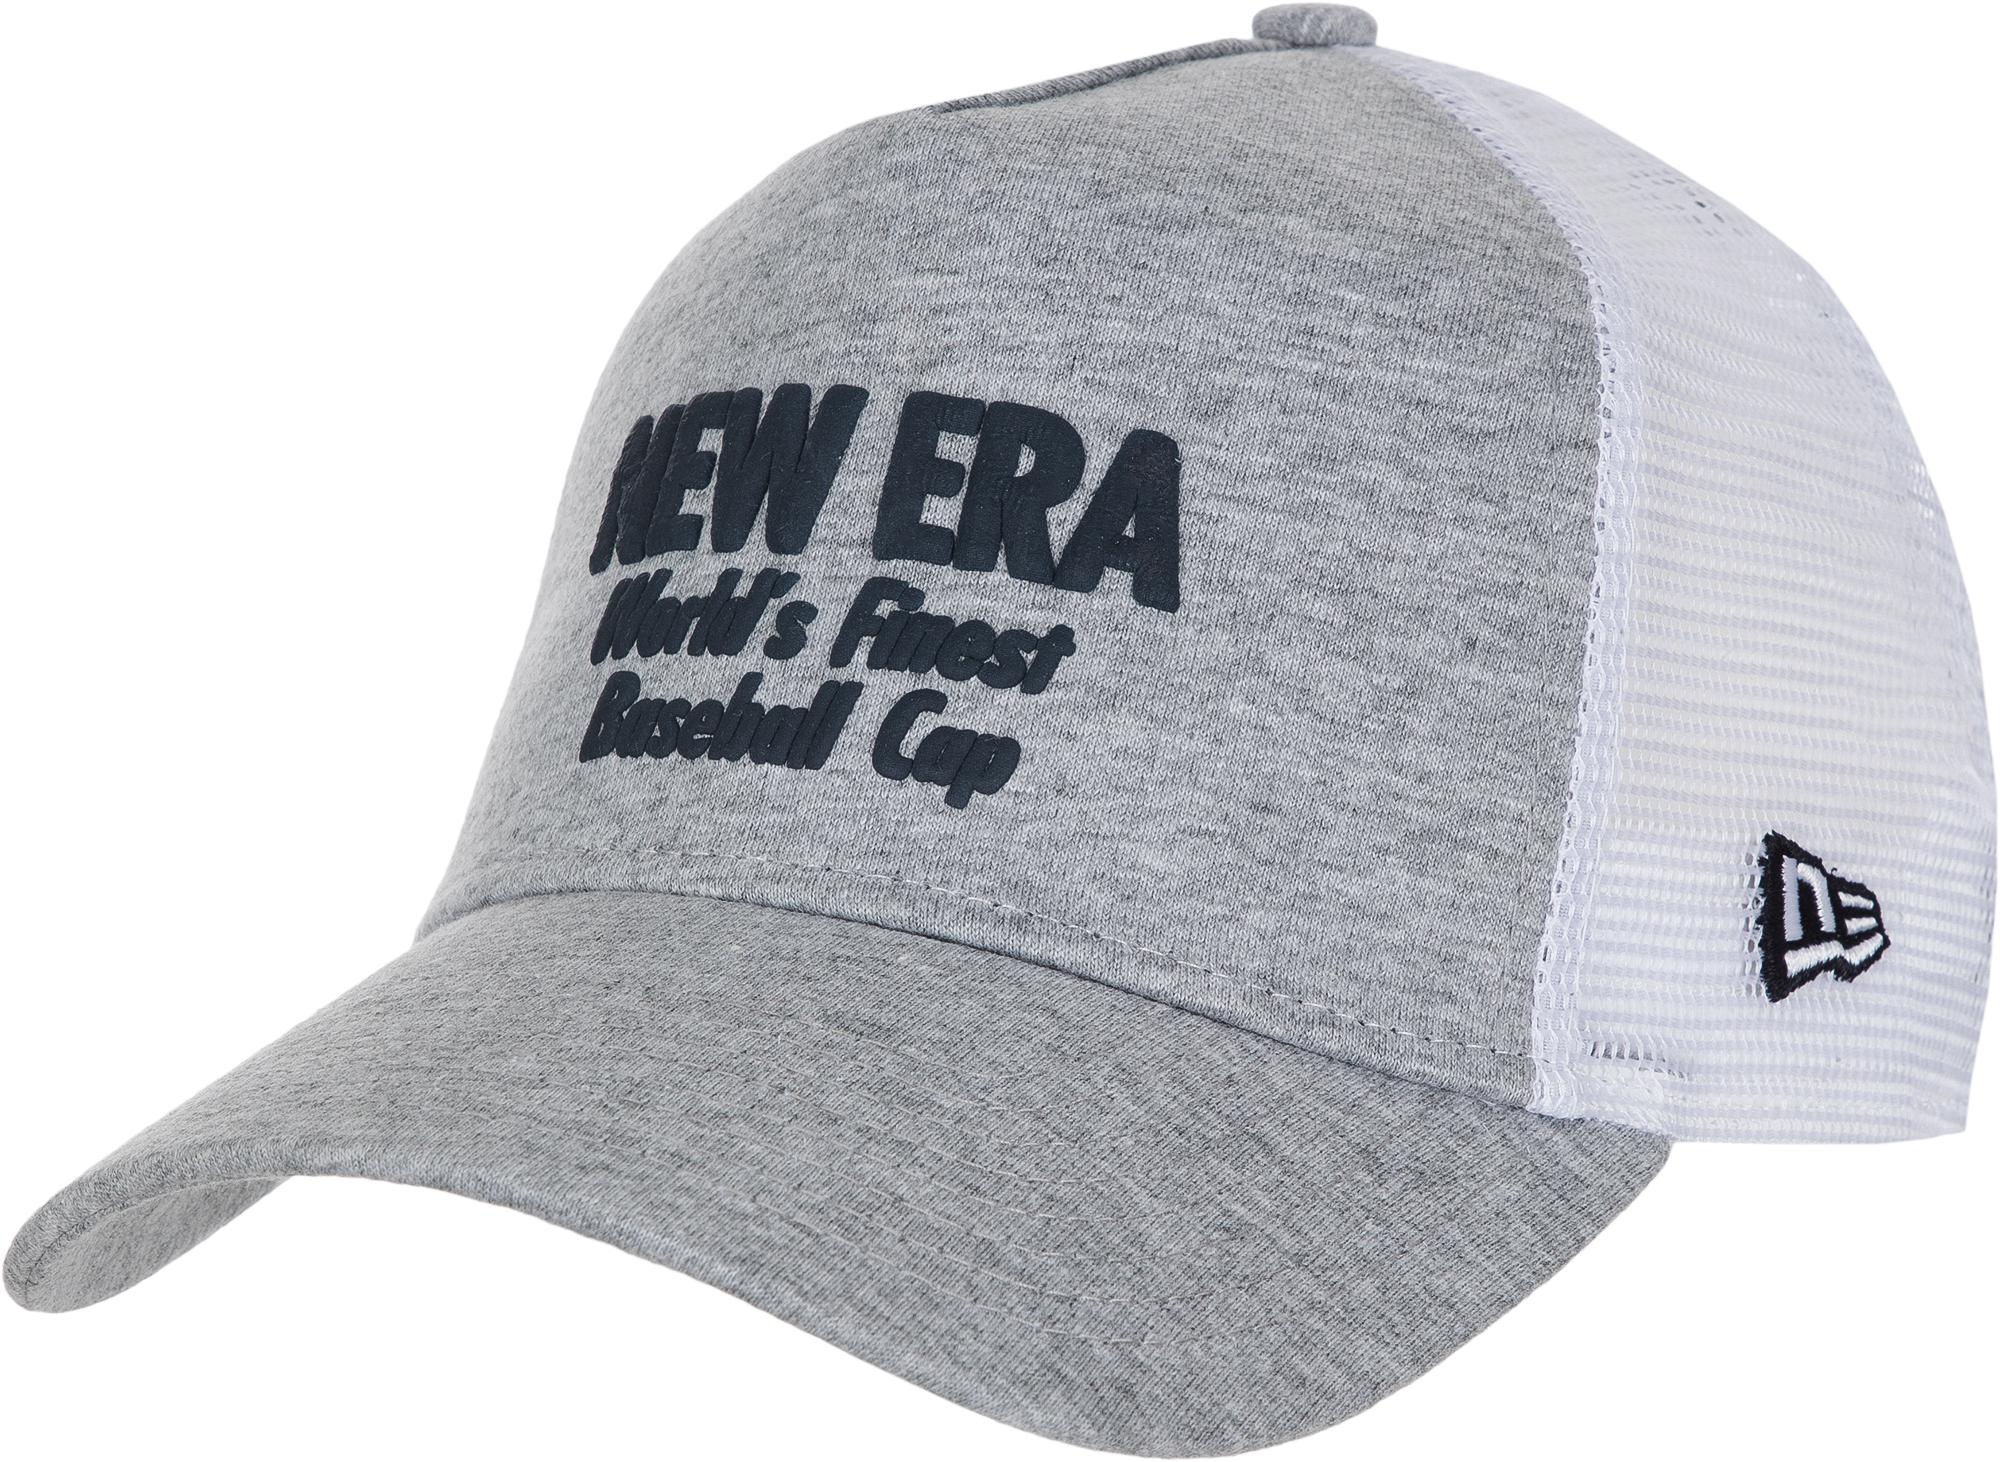 New Era Бейсболка мужская New Era Ne Finest A-Frame Trucker бейсболка new era clean trucker ny scarlet scarlet white o s